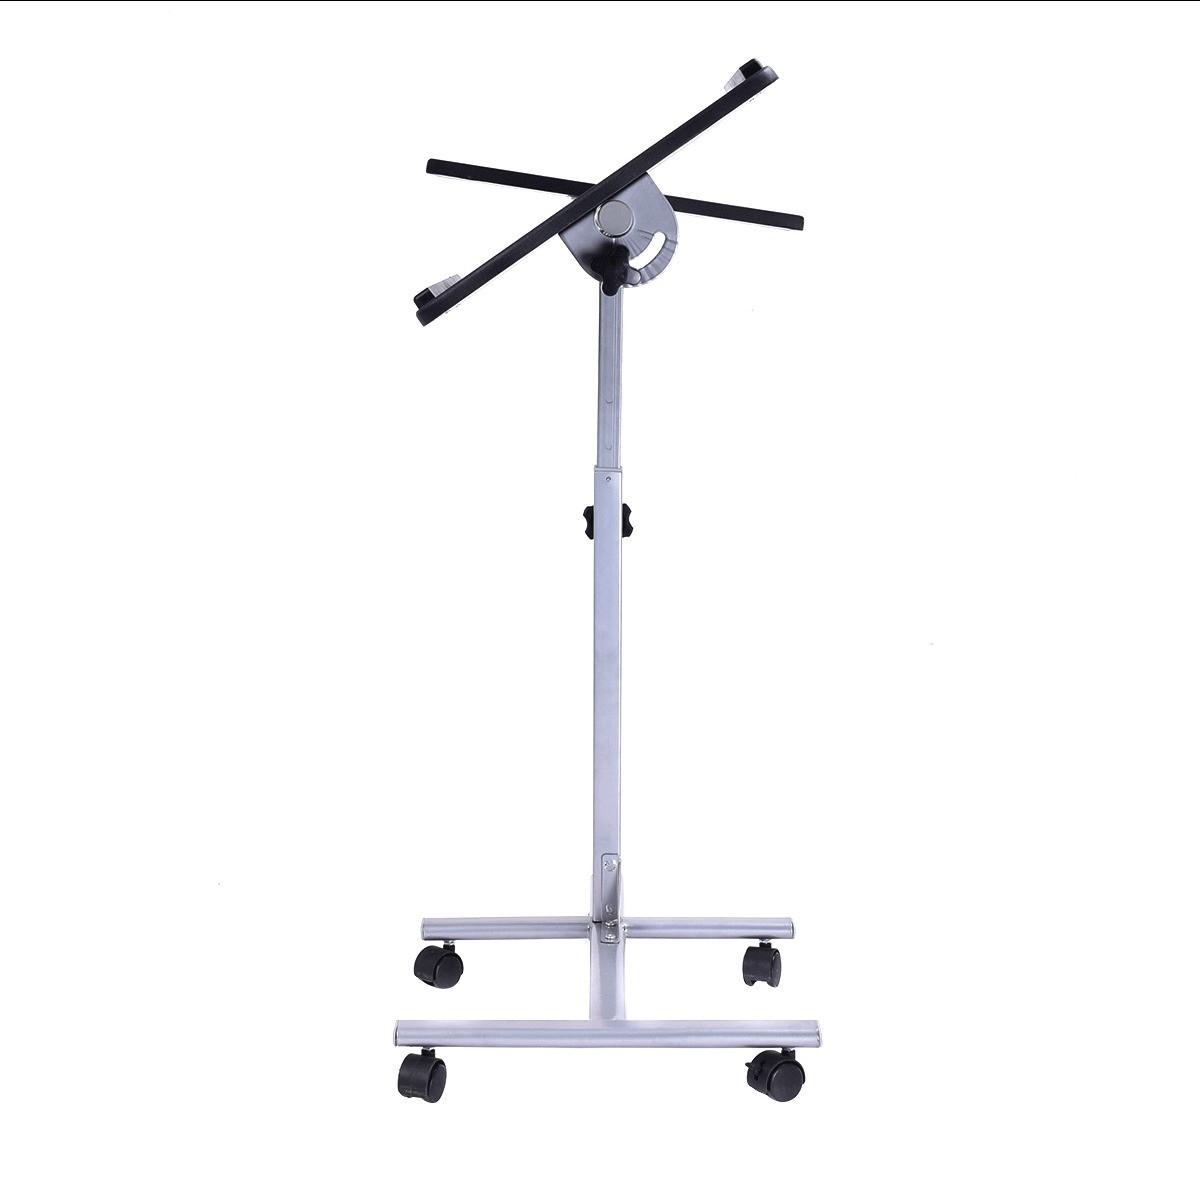 laptop notebook desk stand angle height adjustable rolling over sofa bed table ebay. Black Bedroom Furniture Sets. Home Design Ideas